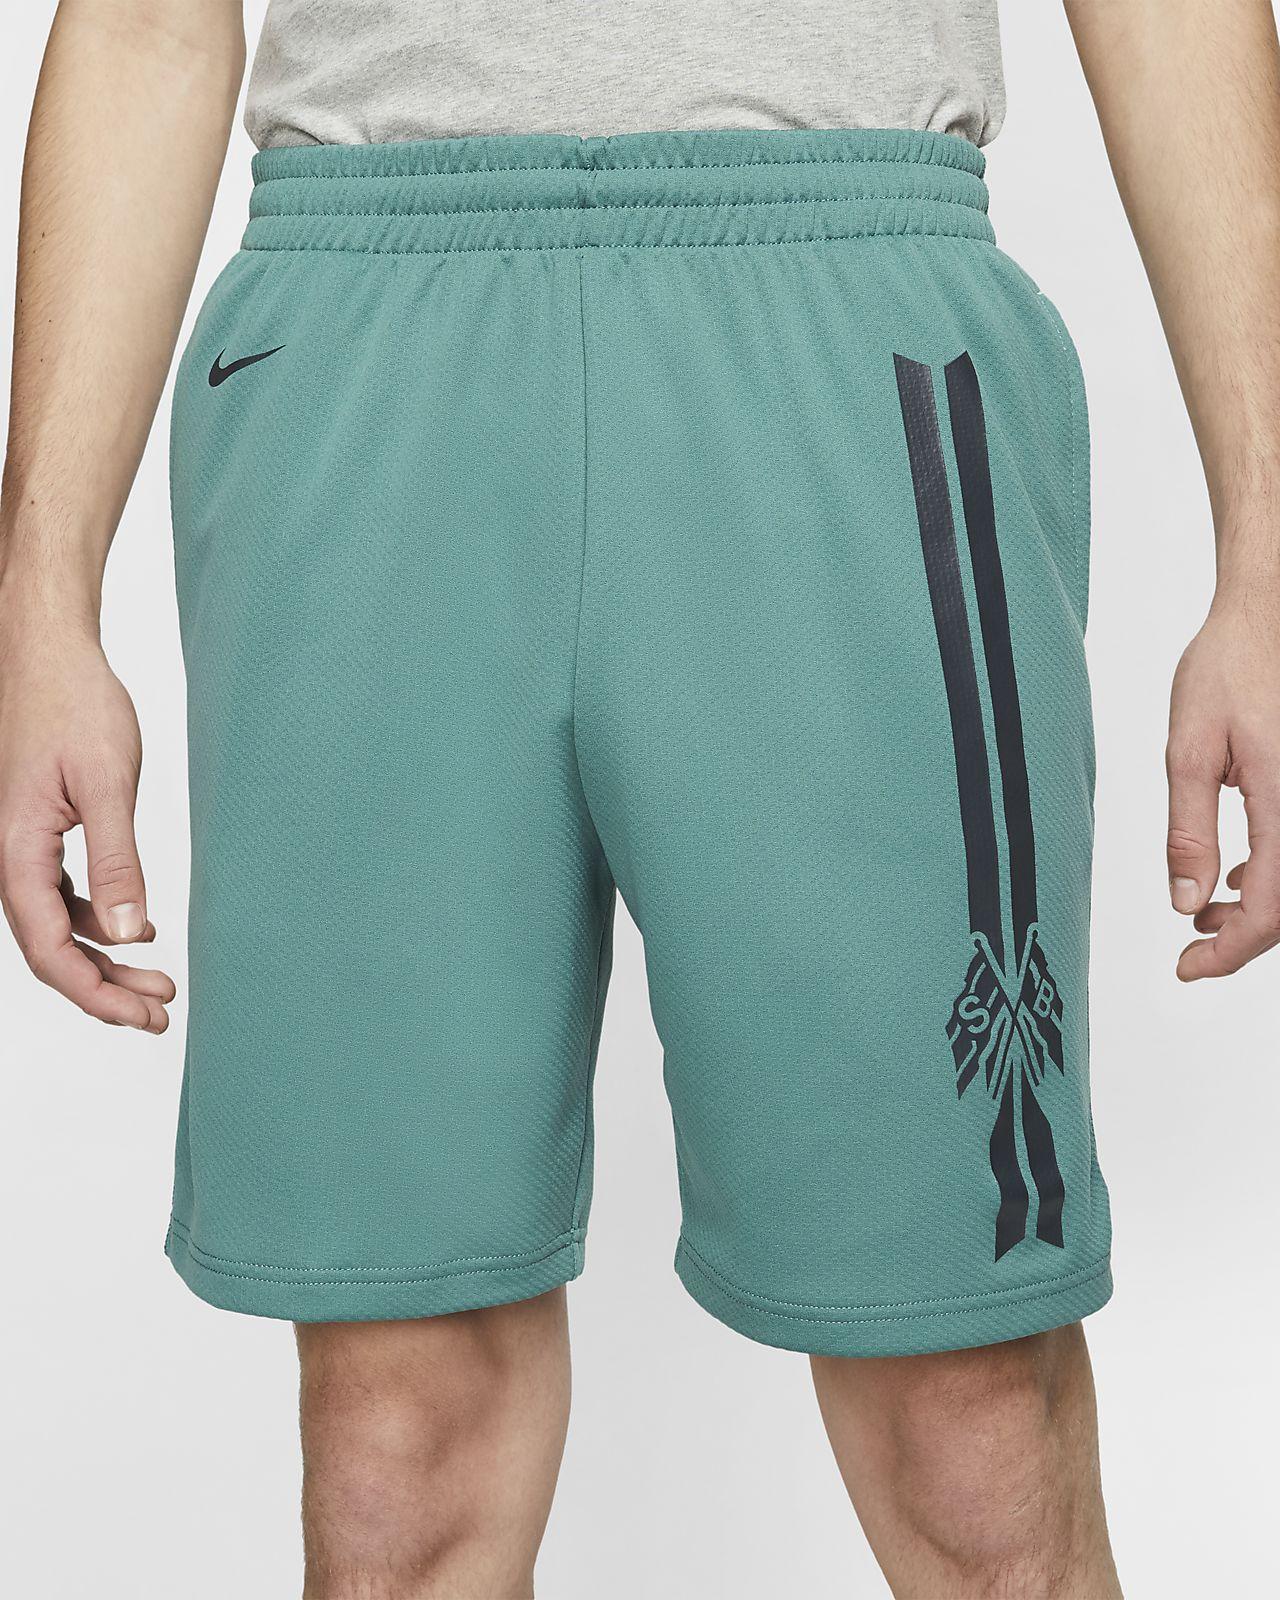 Nike SB Dri-FIT Sunday Pantalons curts estampats de skateboard - Home